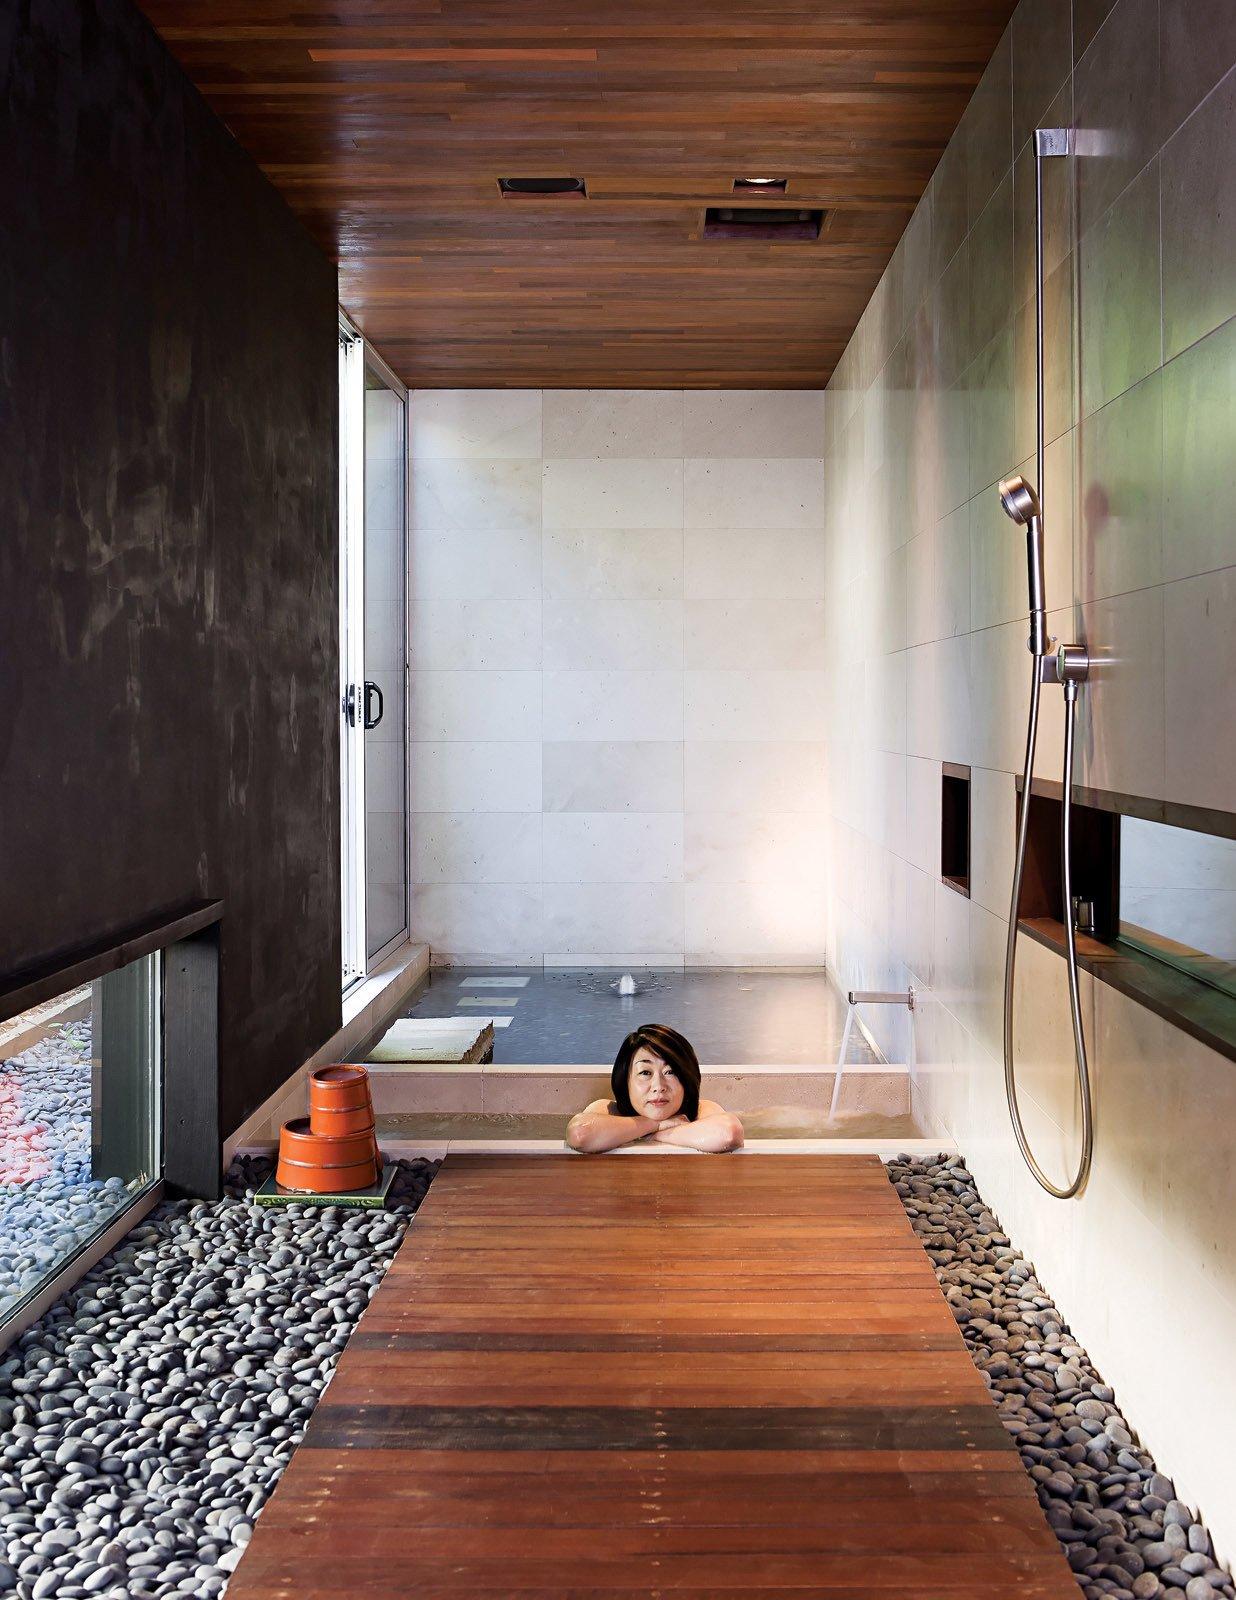 Bath Room, Ceramic Tile Wall, and Medium Hardwood Floor #modern #moderndesign #bath&spa #bathroom #interior #shower #pebblewalkway #bath #japanese #japanesestyle #soakingtub #woodflooring #dornbracht   Photo 20 of 22 in Bath & Spa Intrigue